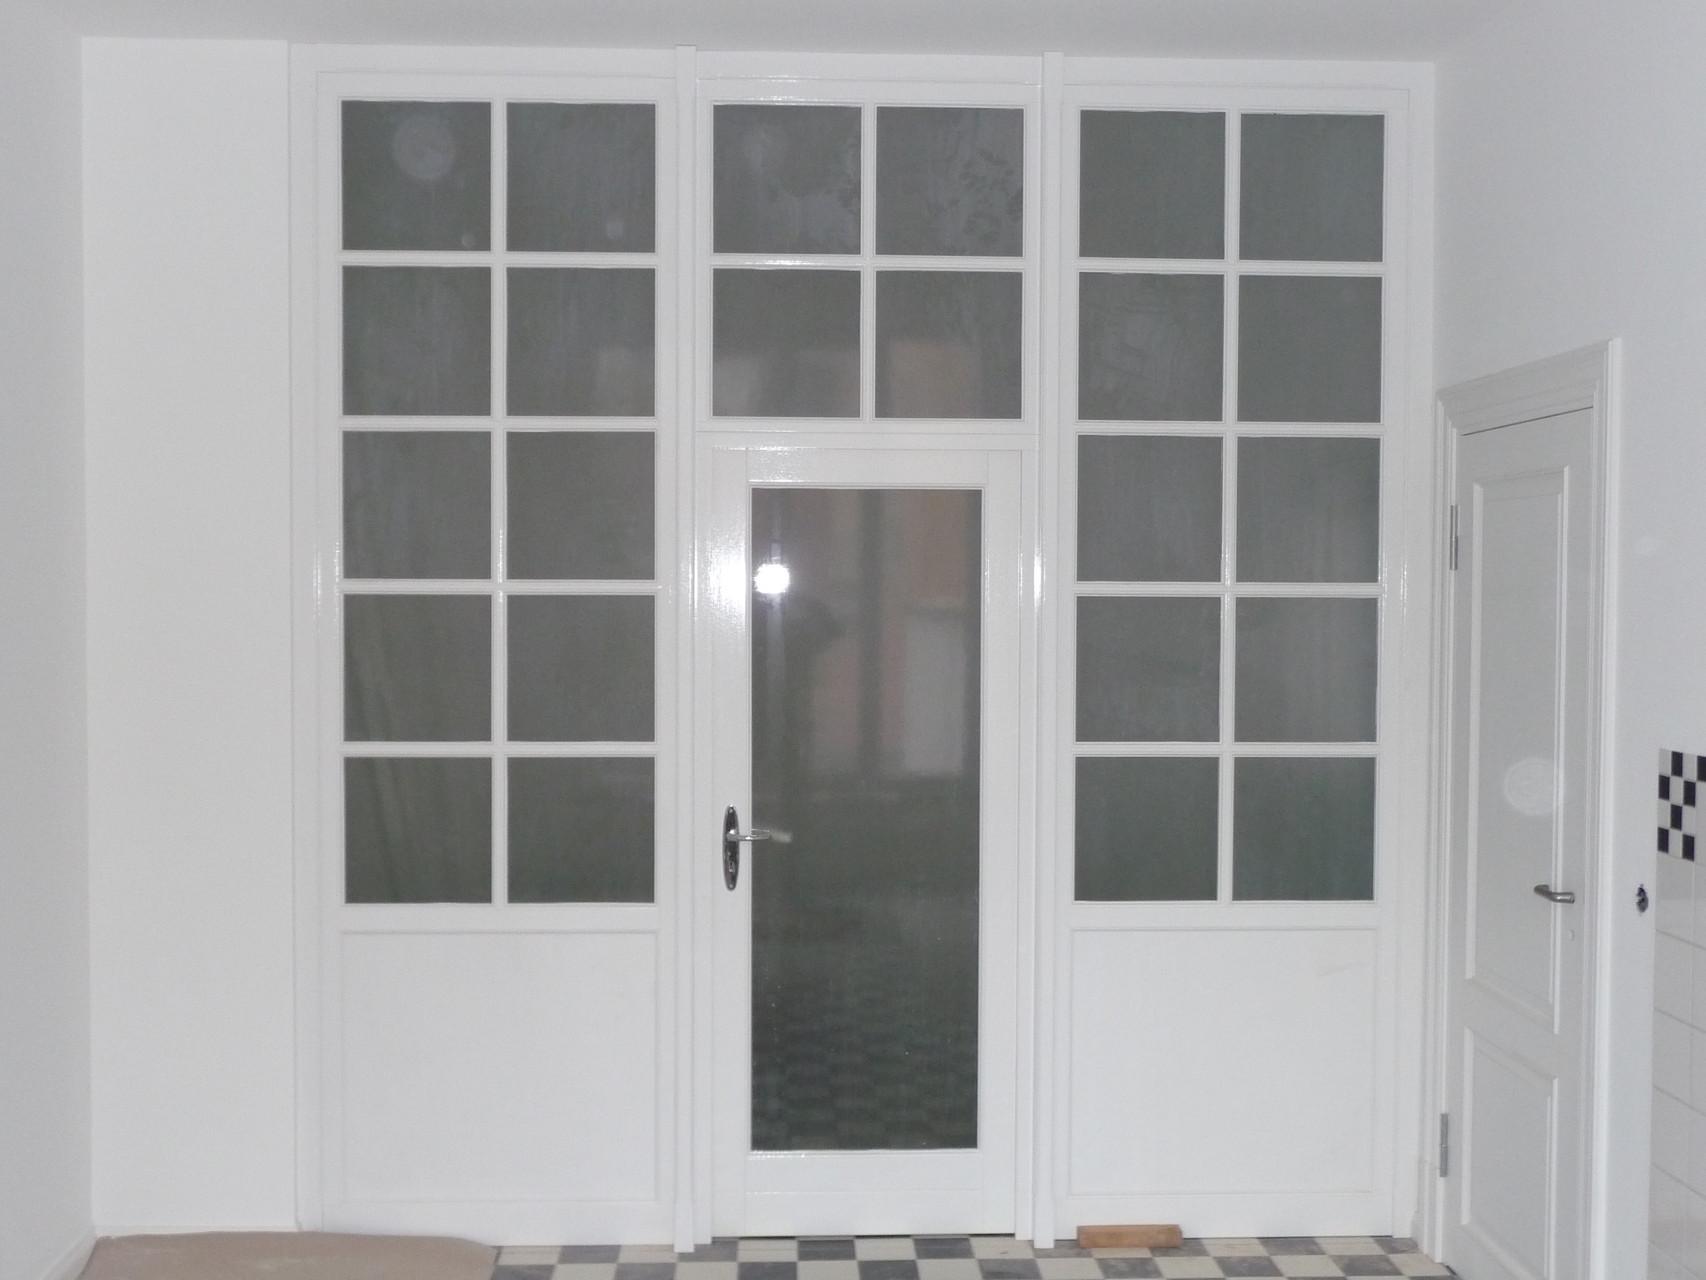 Holz-Trenn-Element weiß